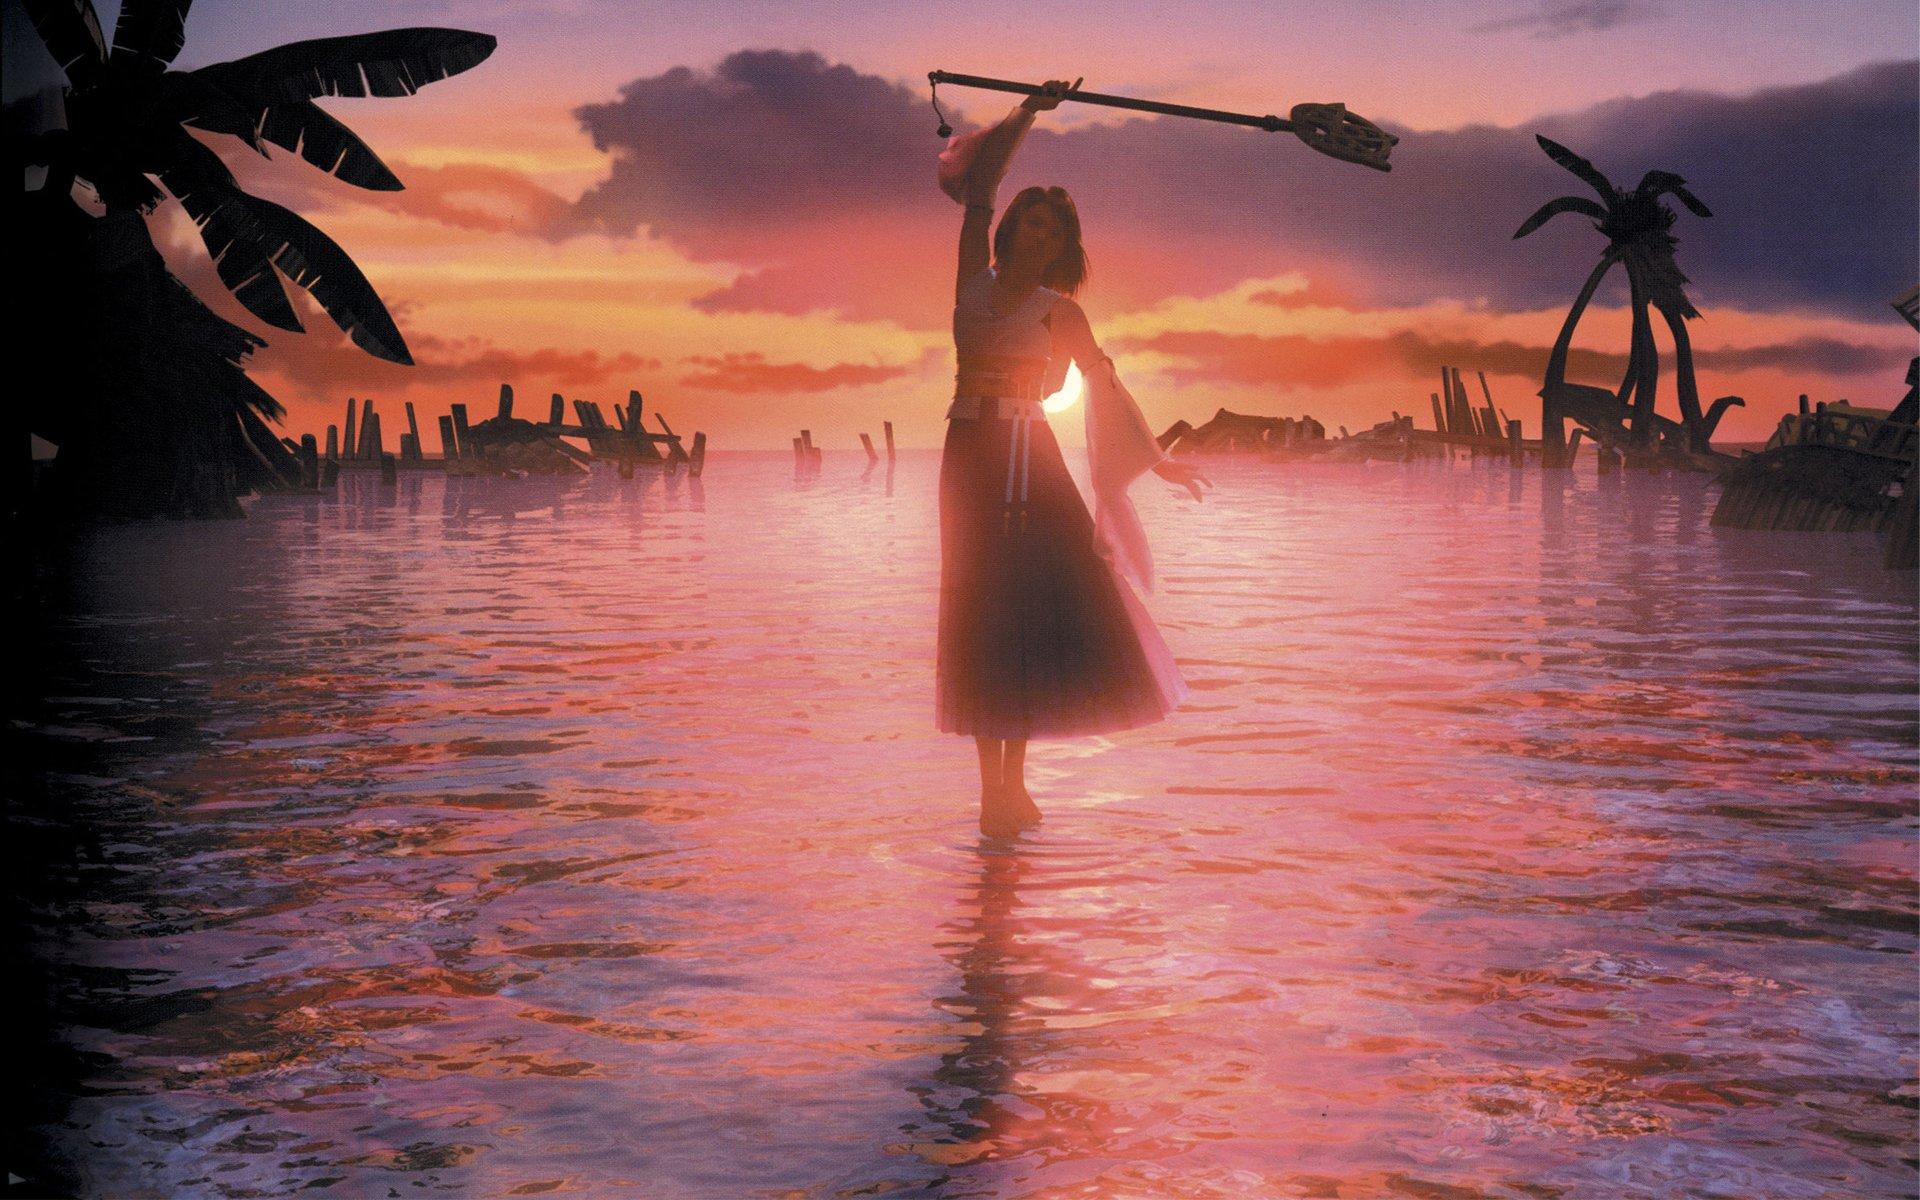 Final fantasy video games yuna final fantasy x wallpaper - Final fantasy yuna wallpaper ...